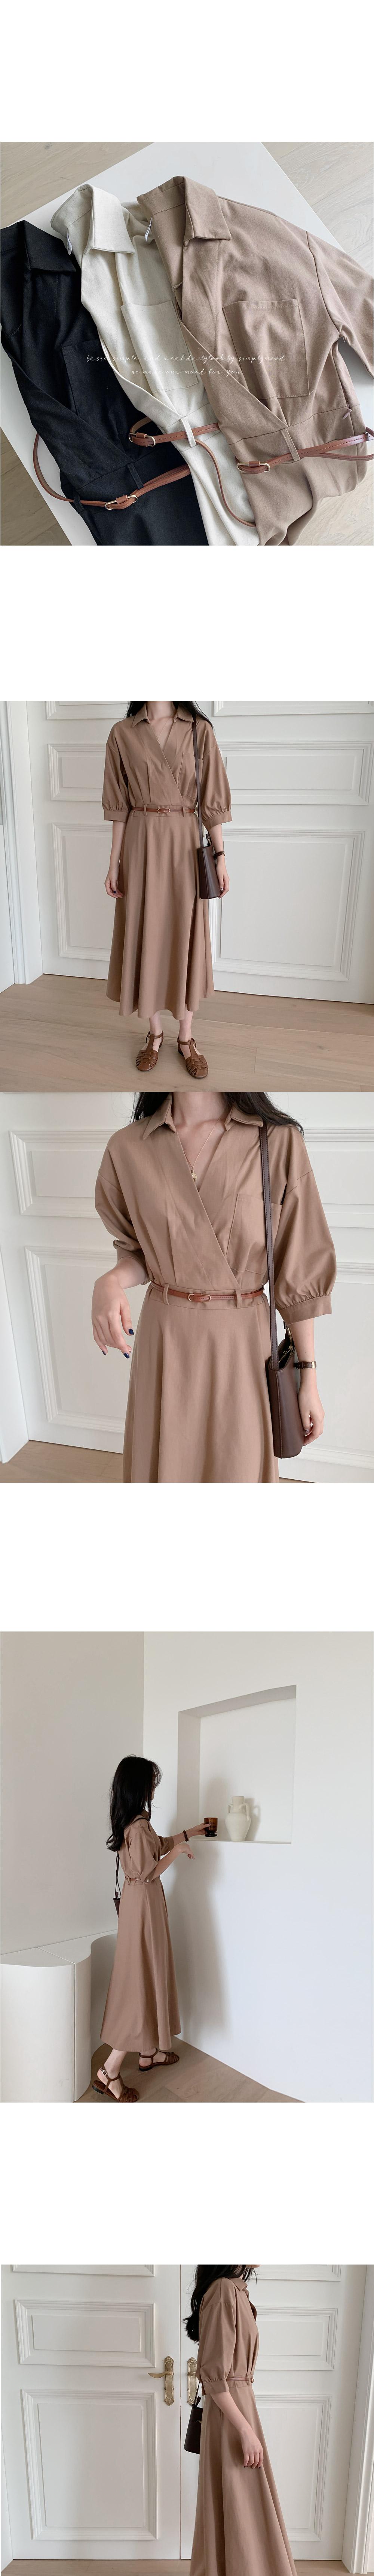 NJ Linen Long Cara Dress